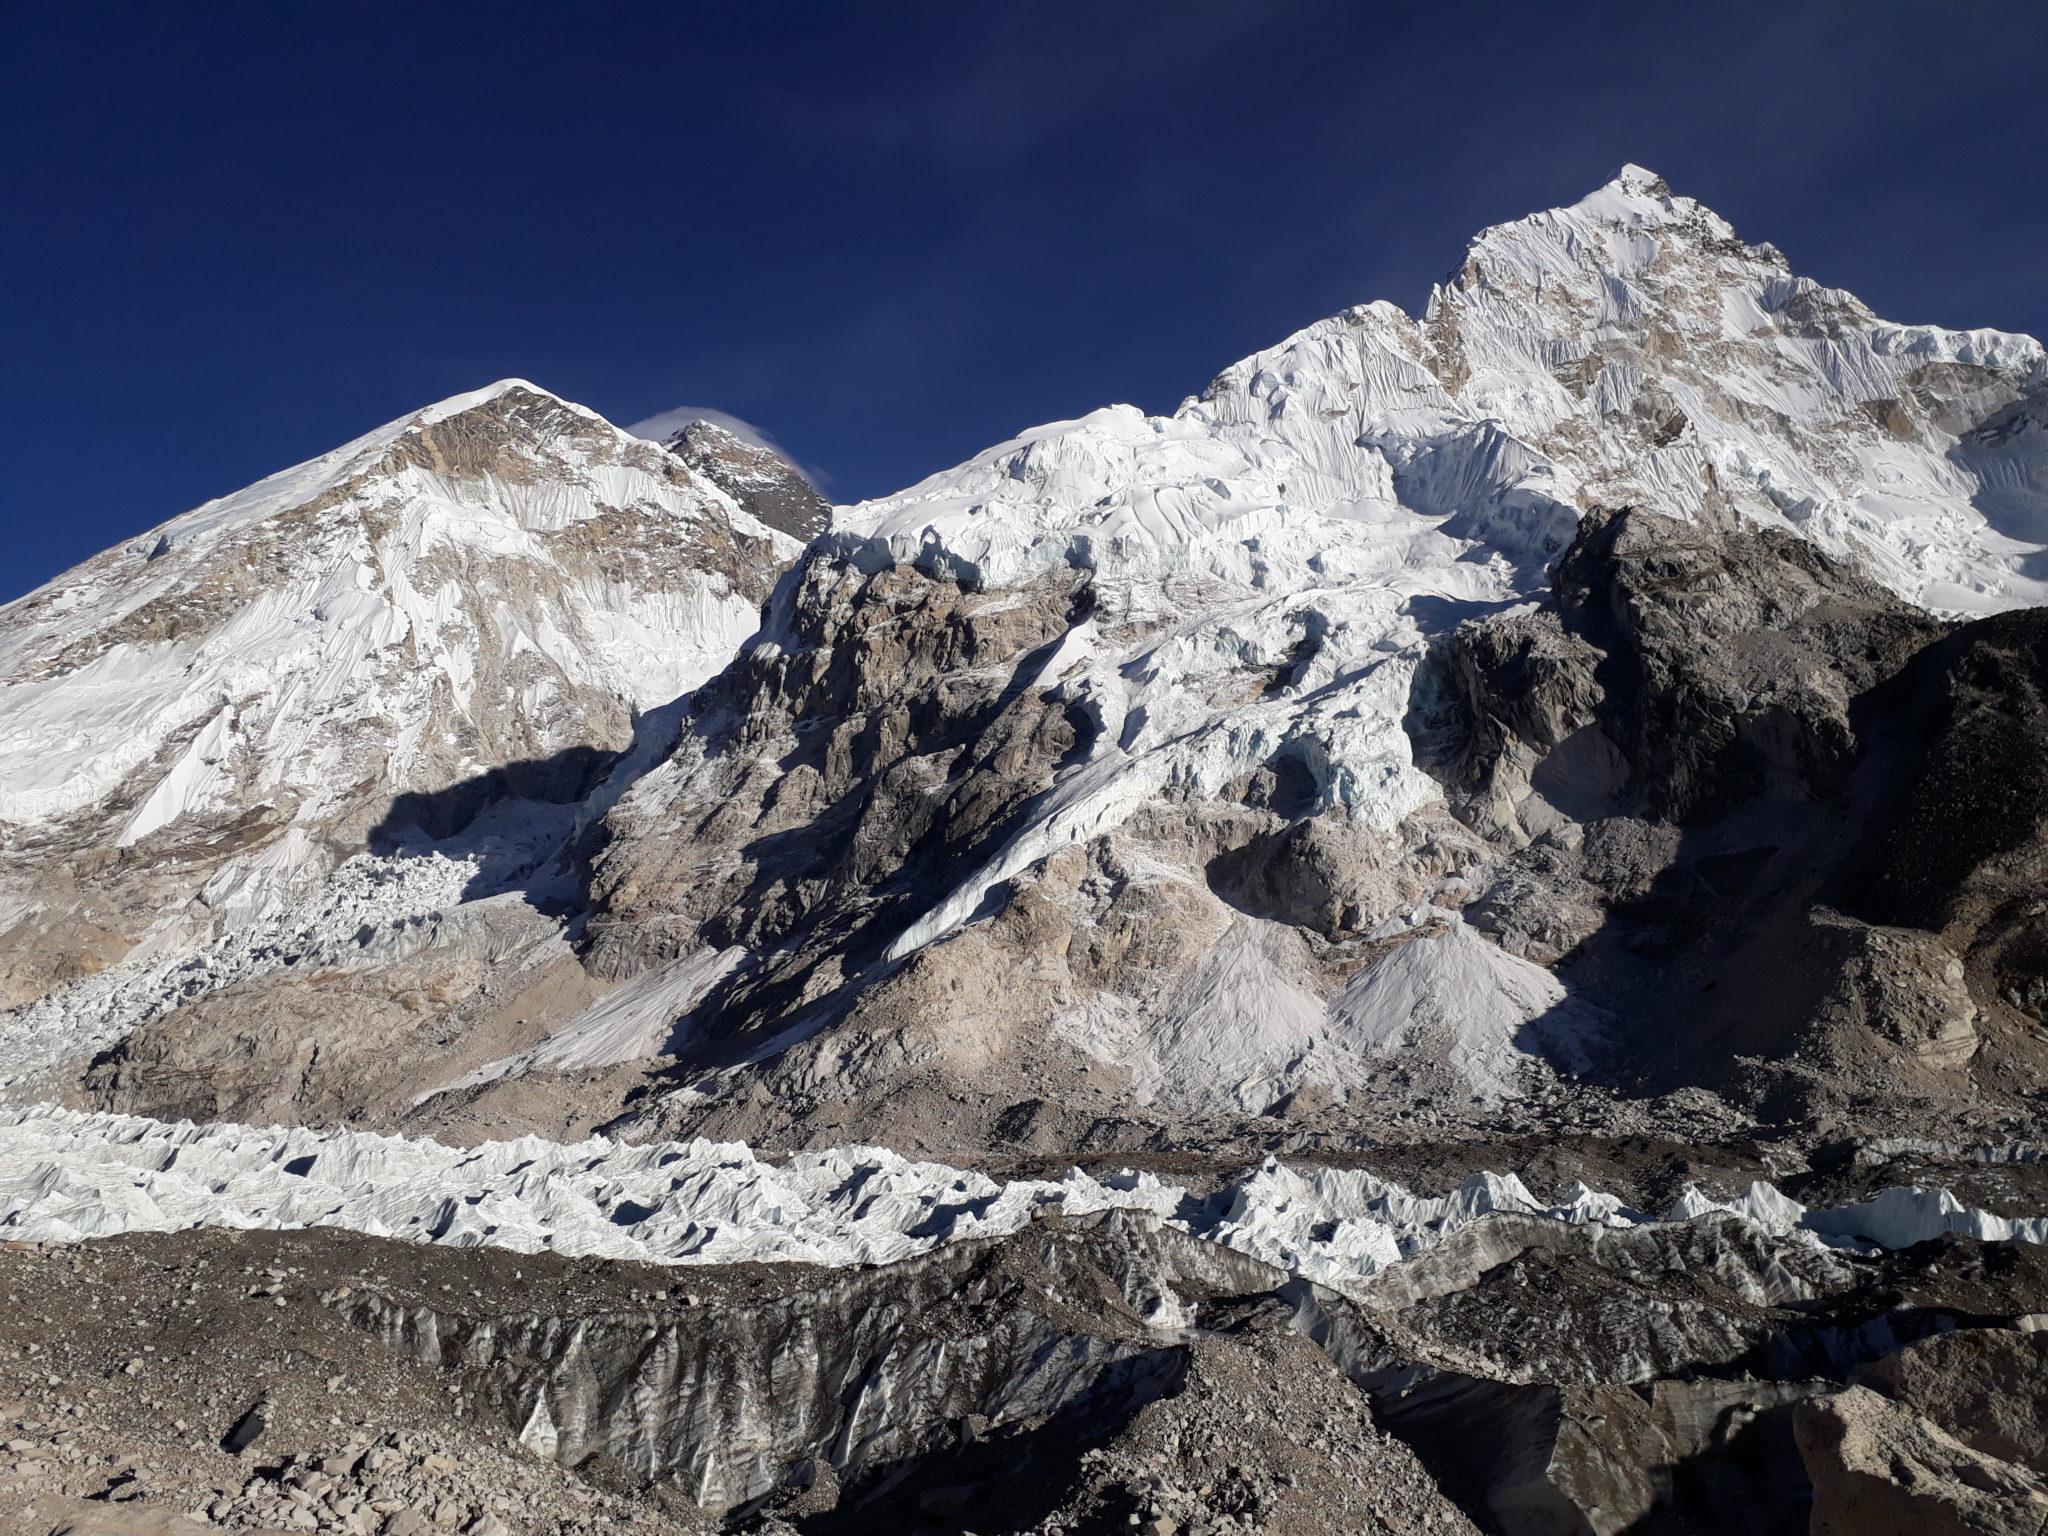 15 day trek to Everest Base Camp: Khumbu trekking holiday in Nepal